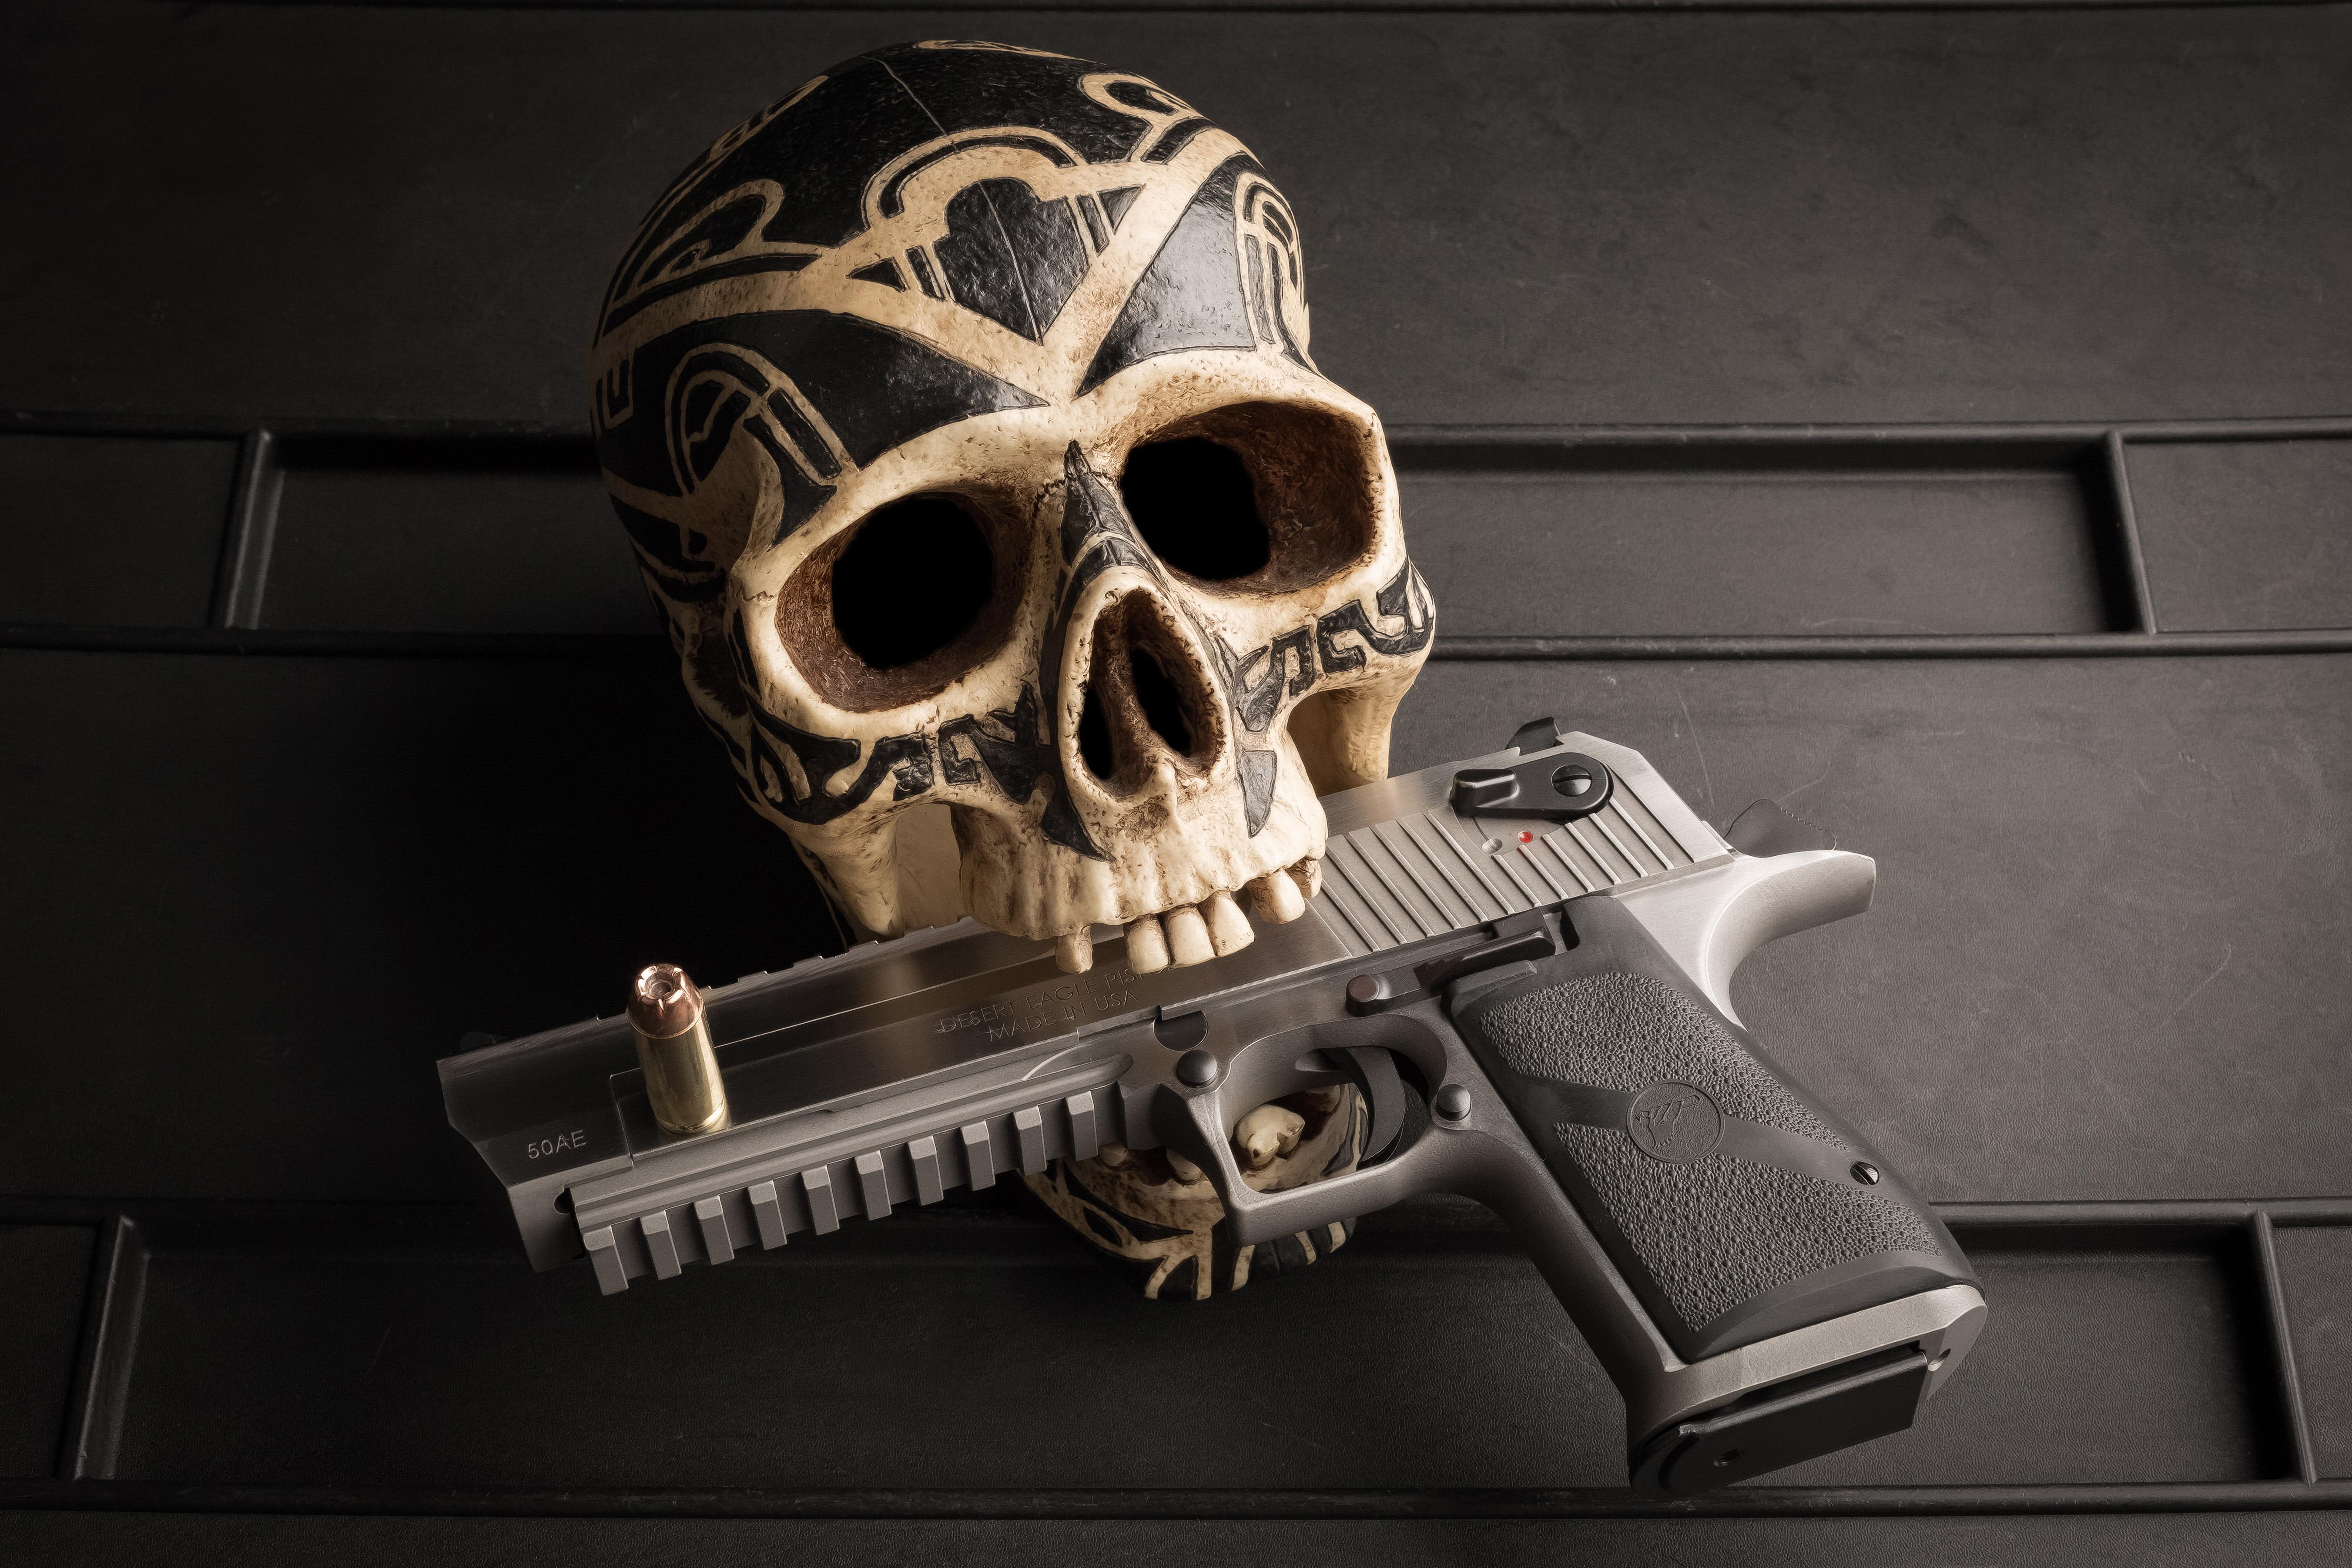 Skull Pistol 5k Hd Others 4k Wallpapers Images Backgrounds